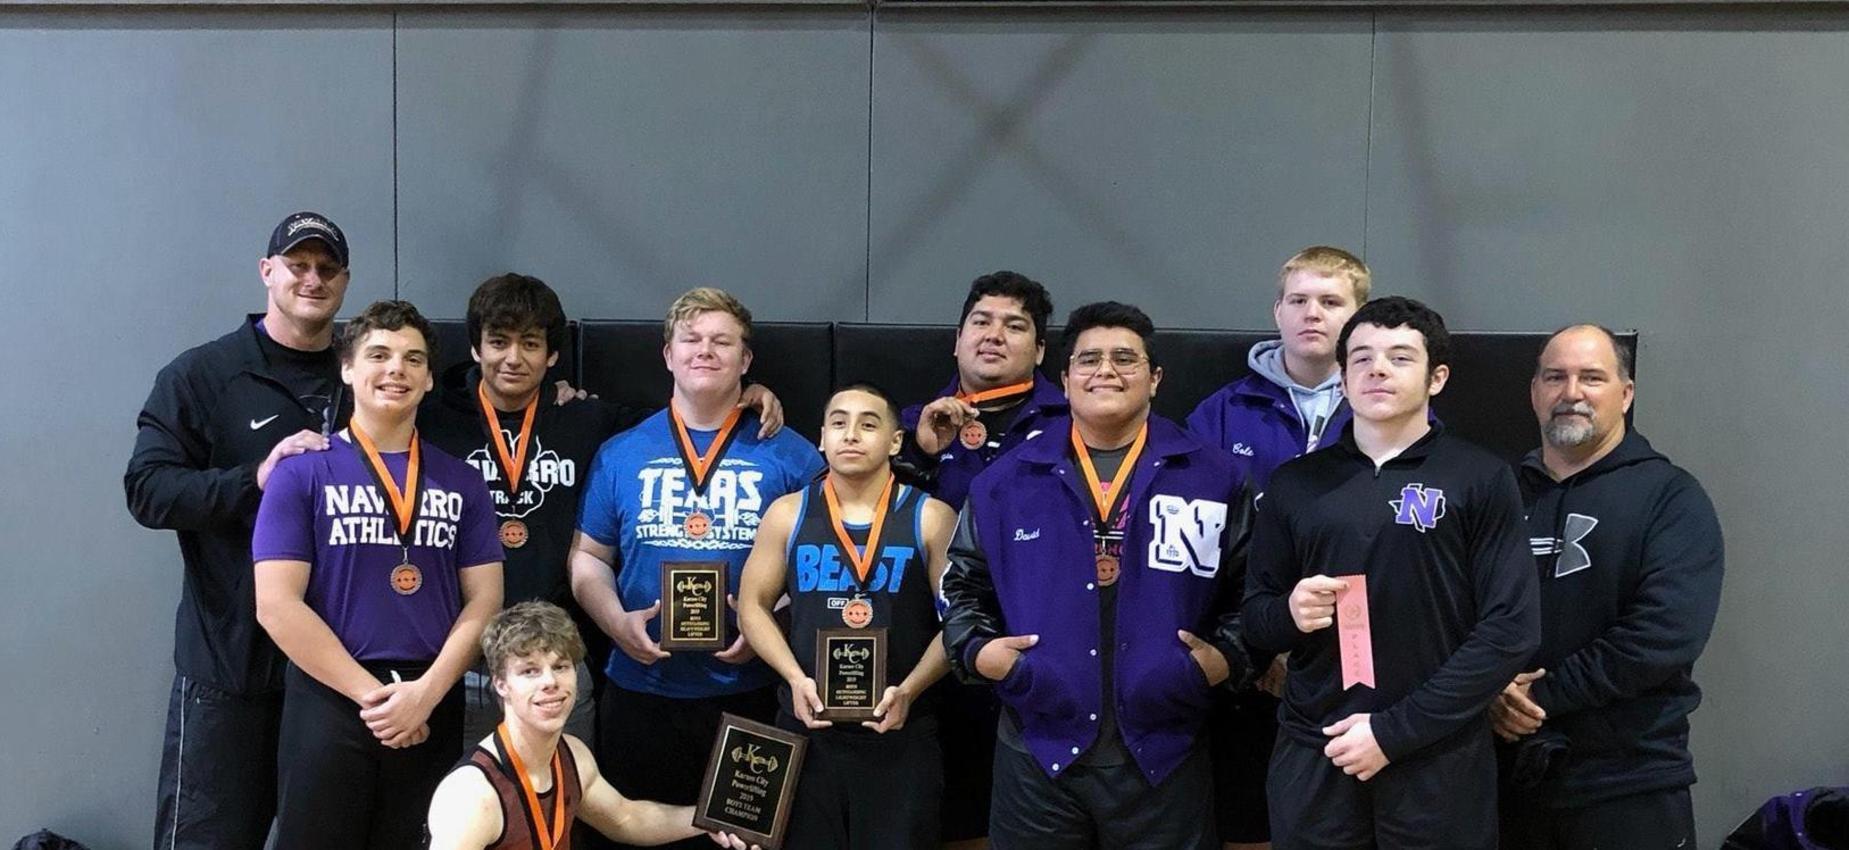 Athletes with awards